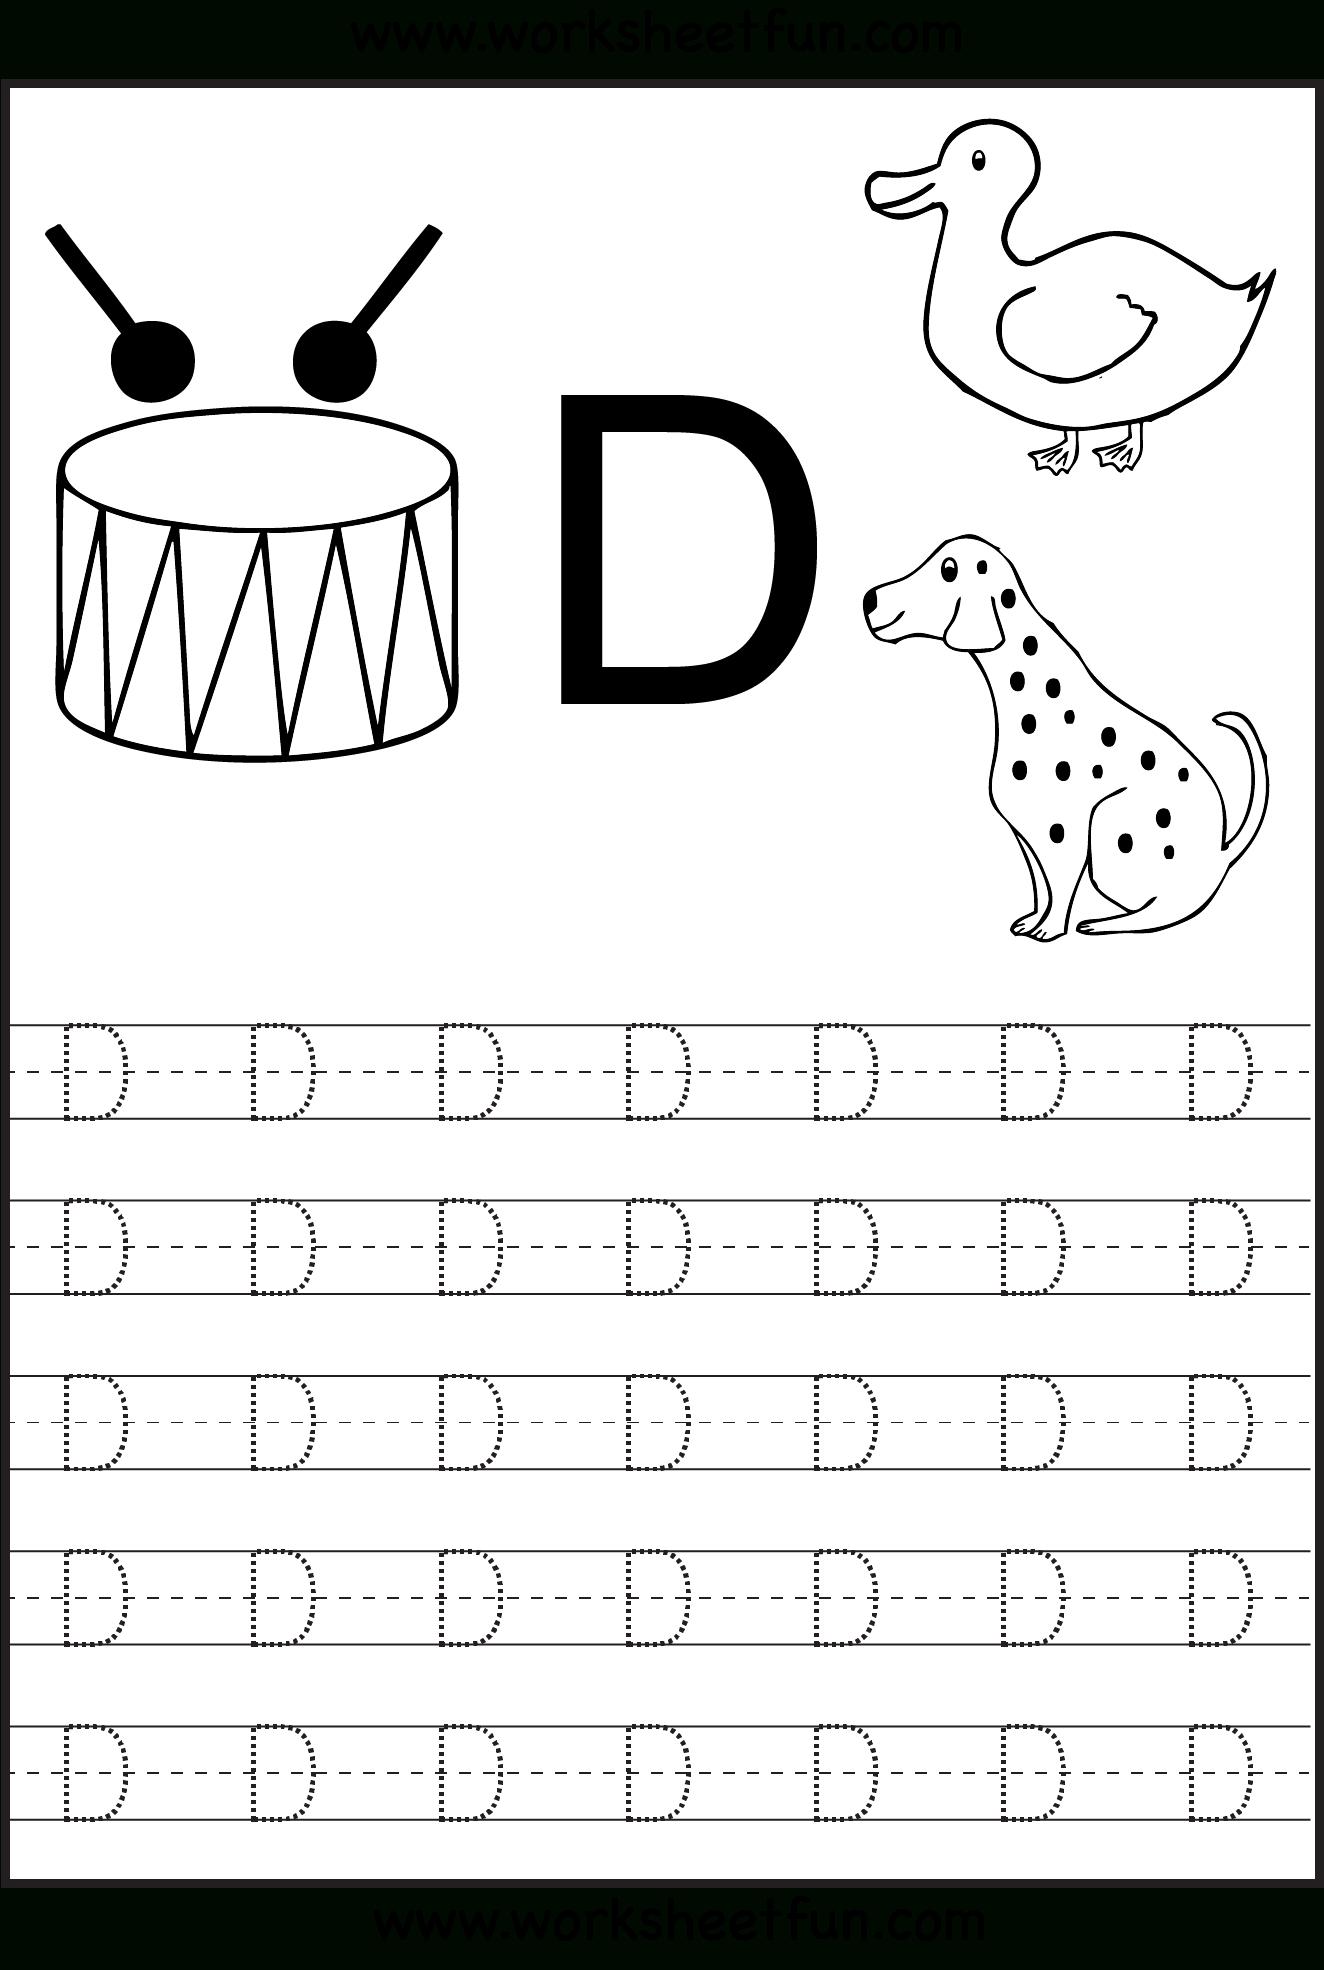 Free Printable Worksheets - Contents | Alphabet Tracing inside Alphabet Worksheets Letter D